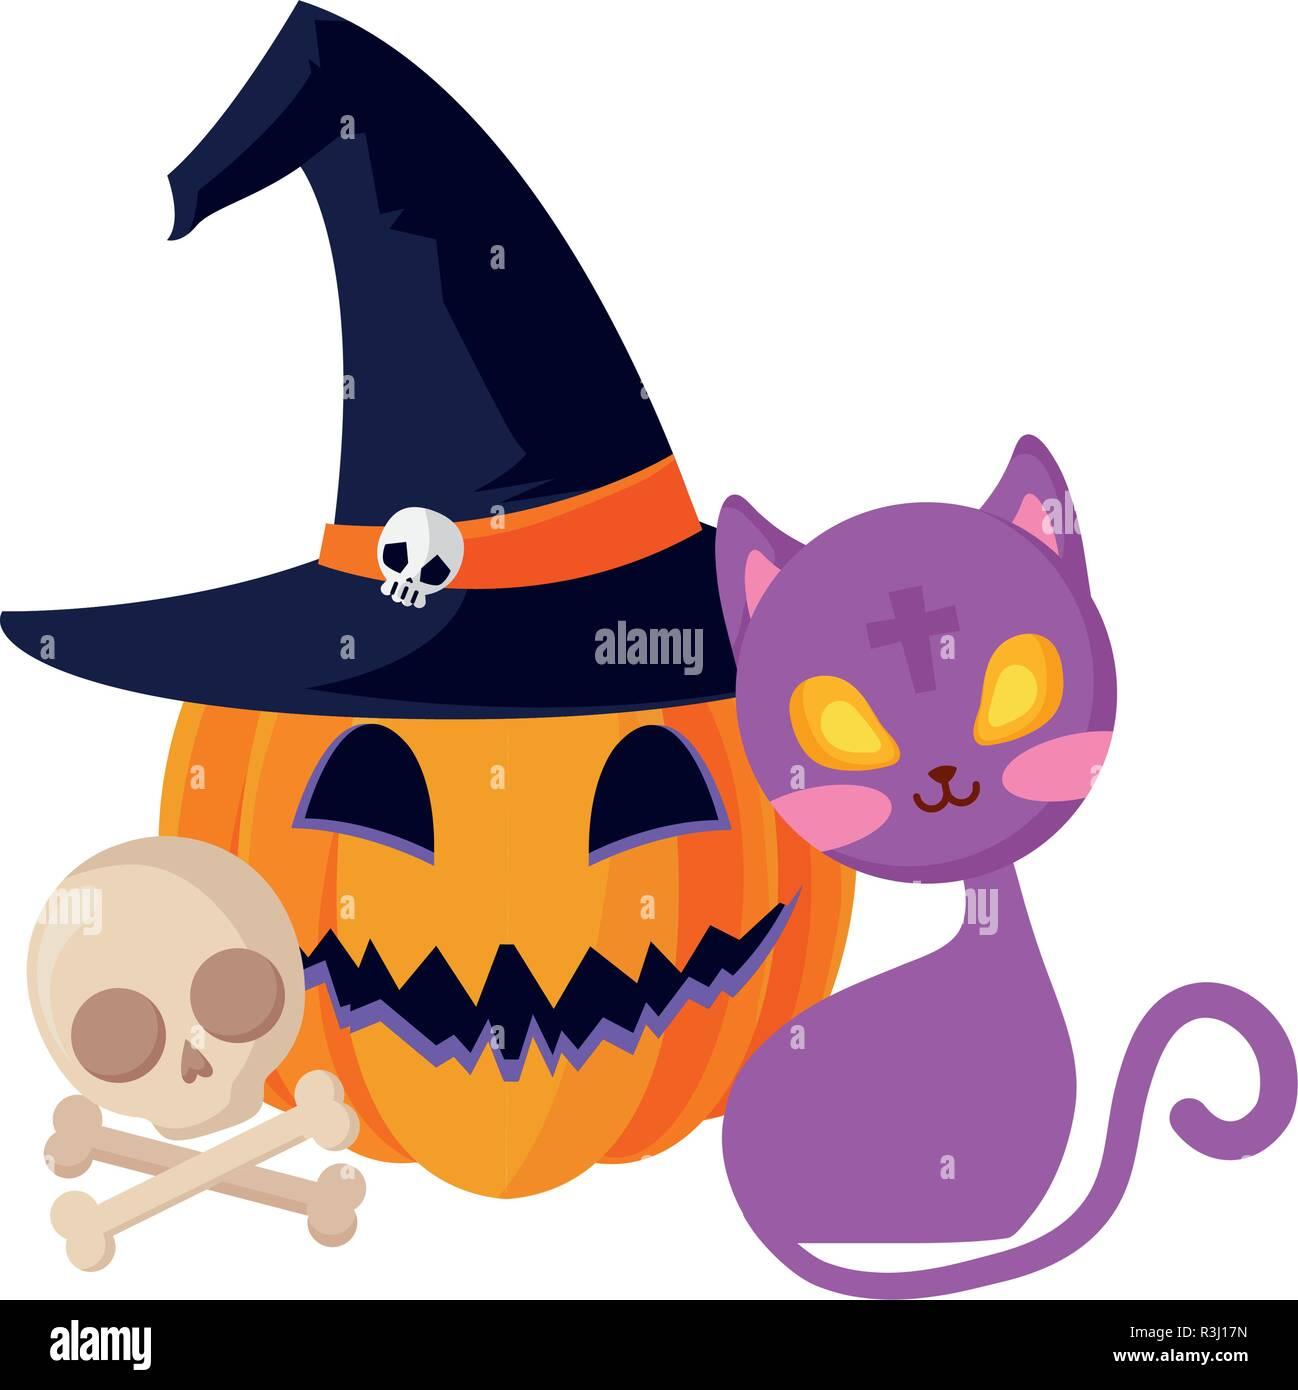 cat and pumpkin and skull halloween celebration vector illustration - Stock Image